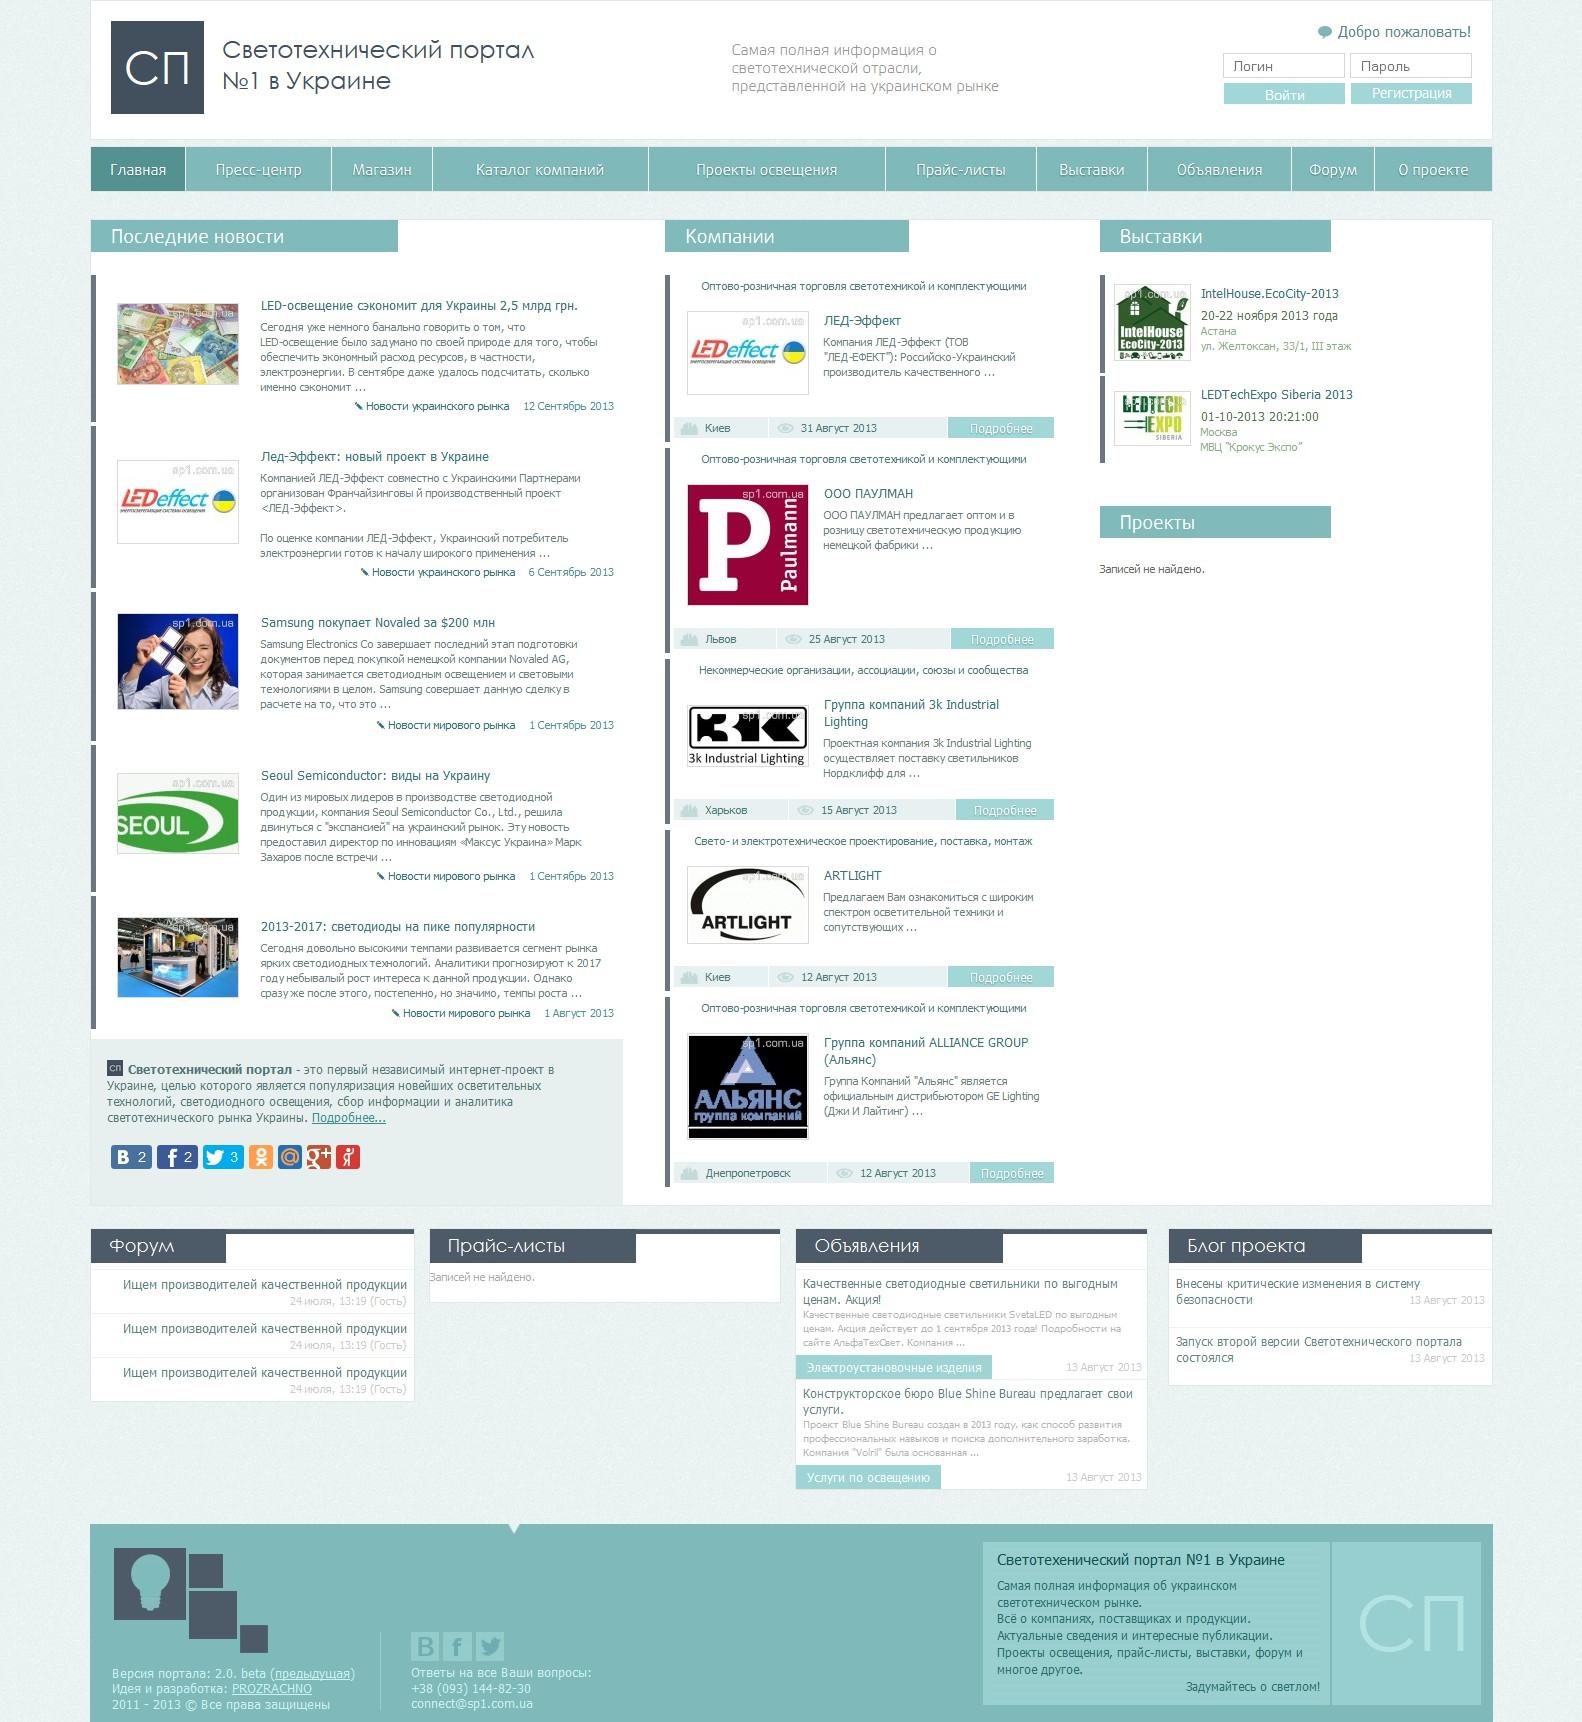 Дизайн проекта SP1.COM.UA